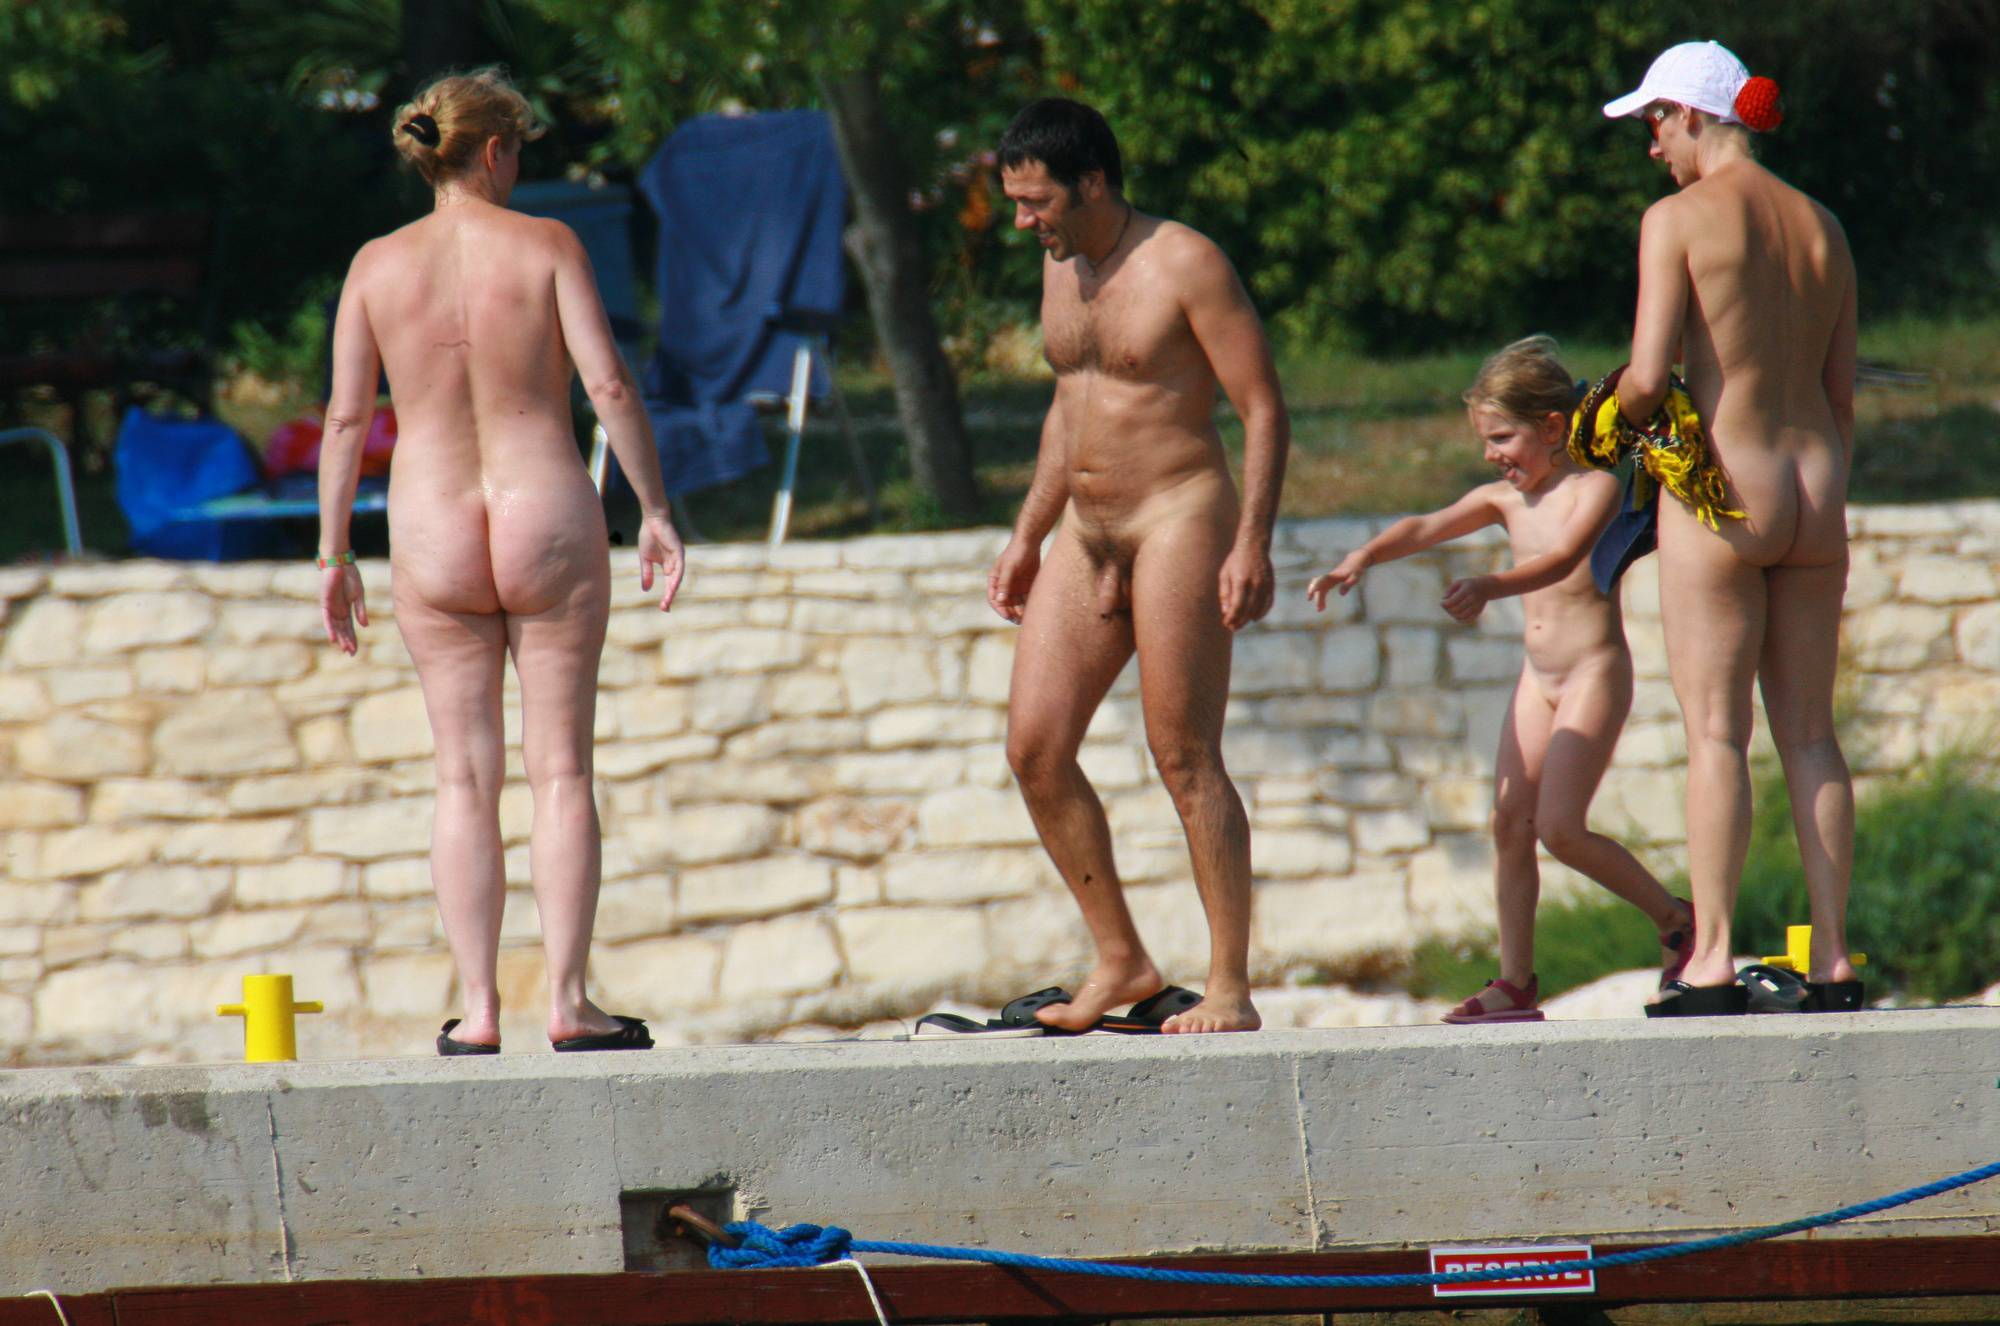 Pure Nudism Pics-Kids Nudist Shore Floater - 3